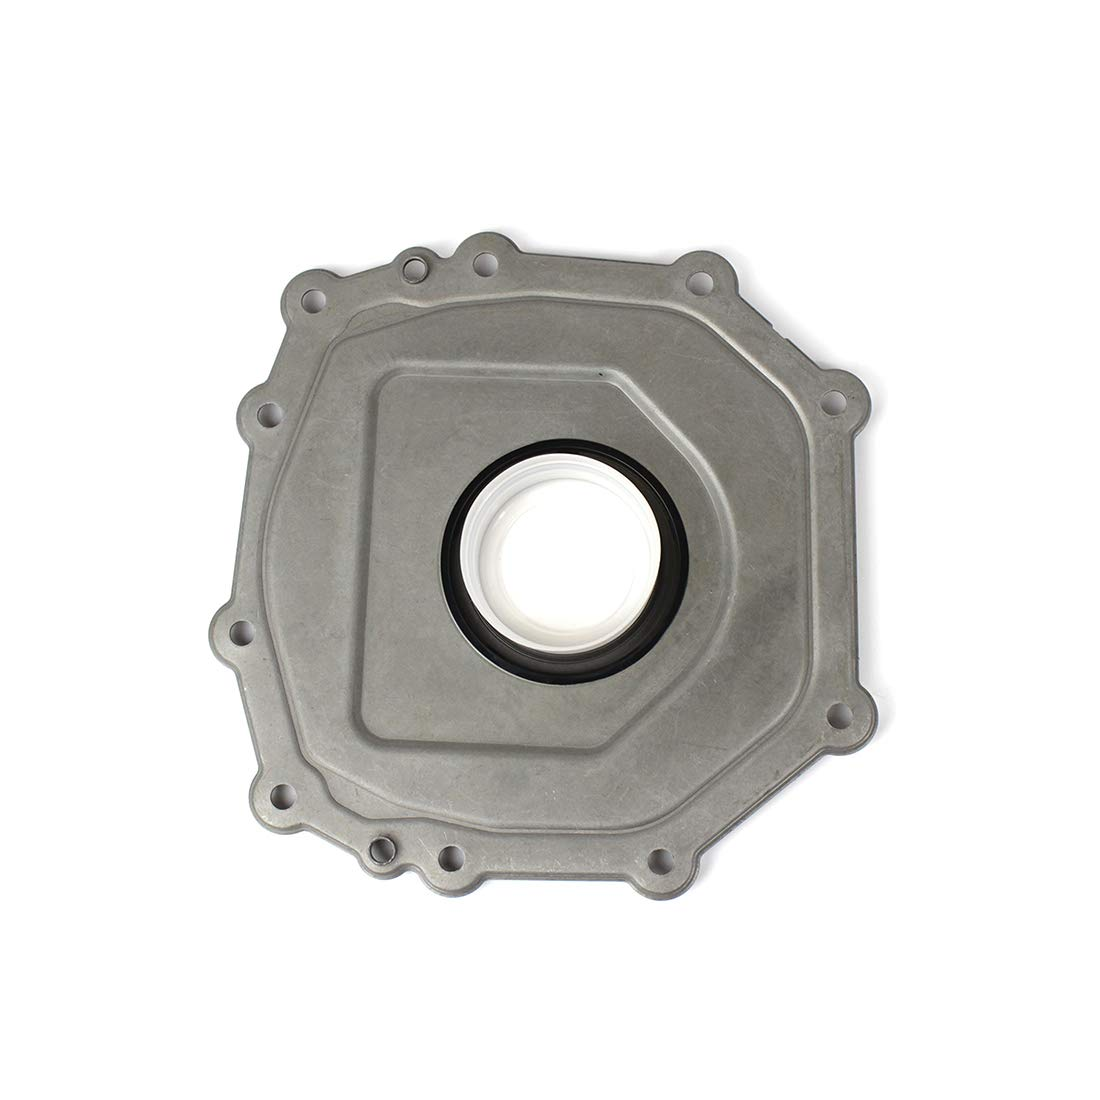 CBTA BGQ BPS CBUA DNJ RM813 Rear Main Seal for 2005-2014 // Volkswagen // 2.5L // L5 // 20V // DOHC // 151cid // BGP BPR